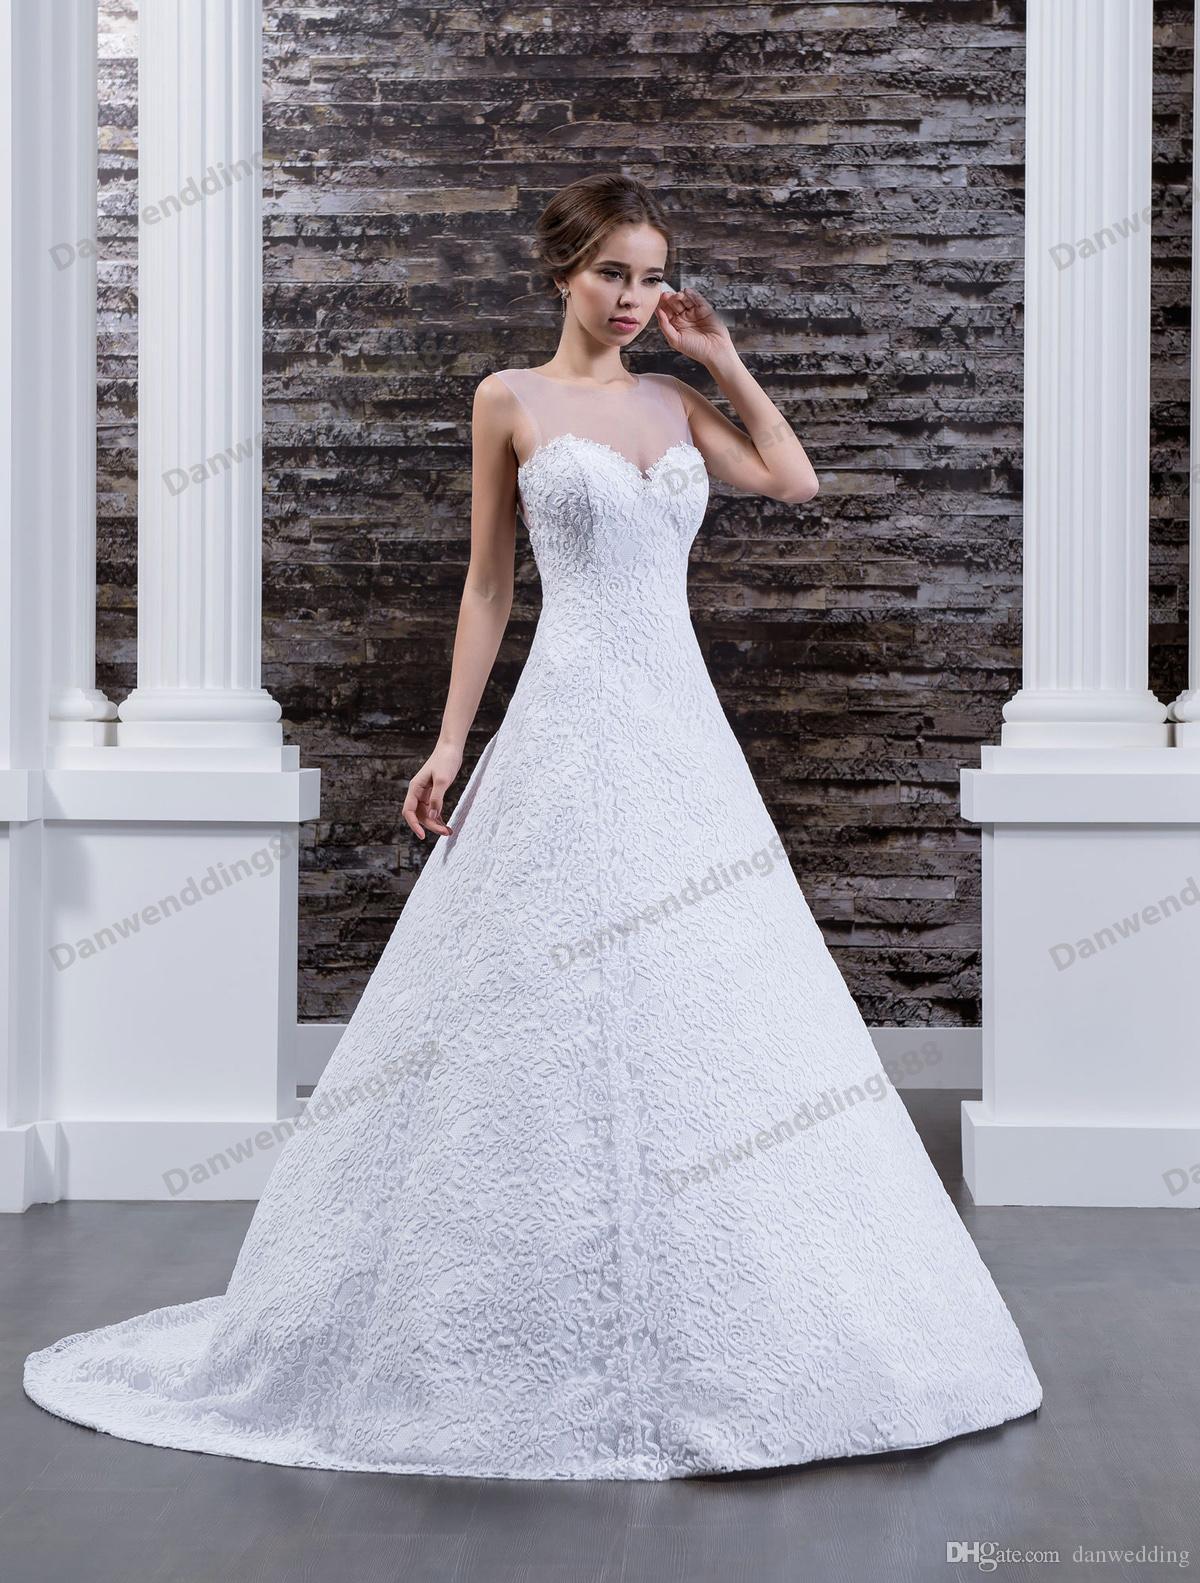 Beauty White Lace Scoop Buttons A-Line Wedding Dresses Bridal Pageant Dresses Wedding Attire Dresses Custom Size 2-16 ZW608075